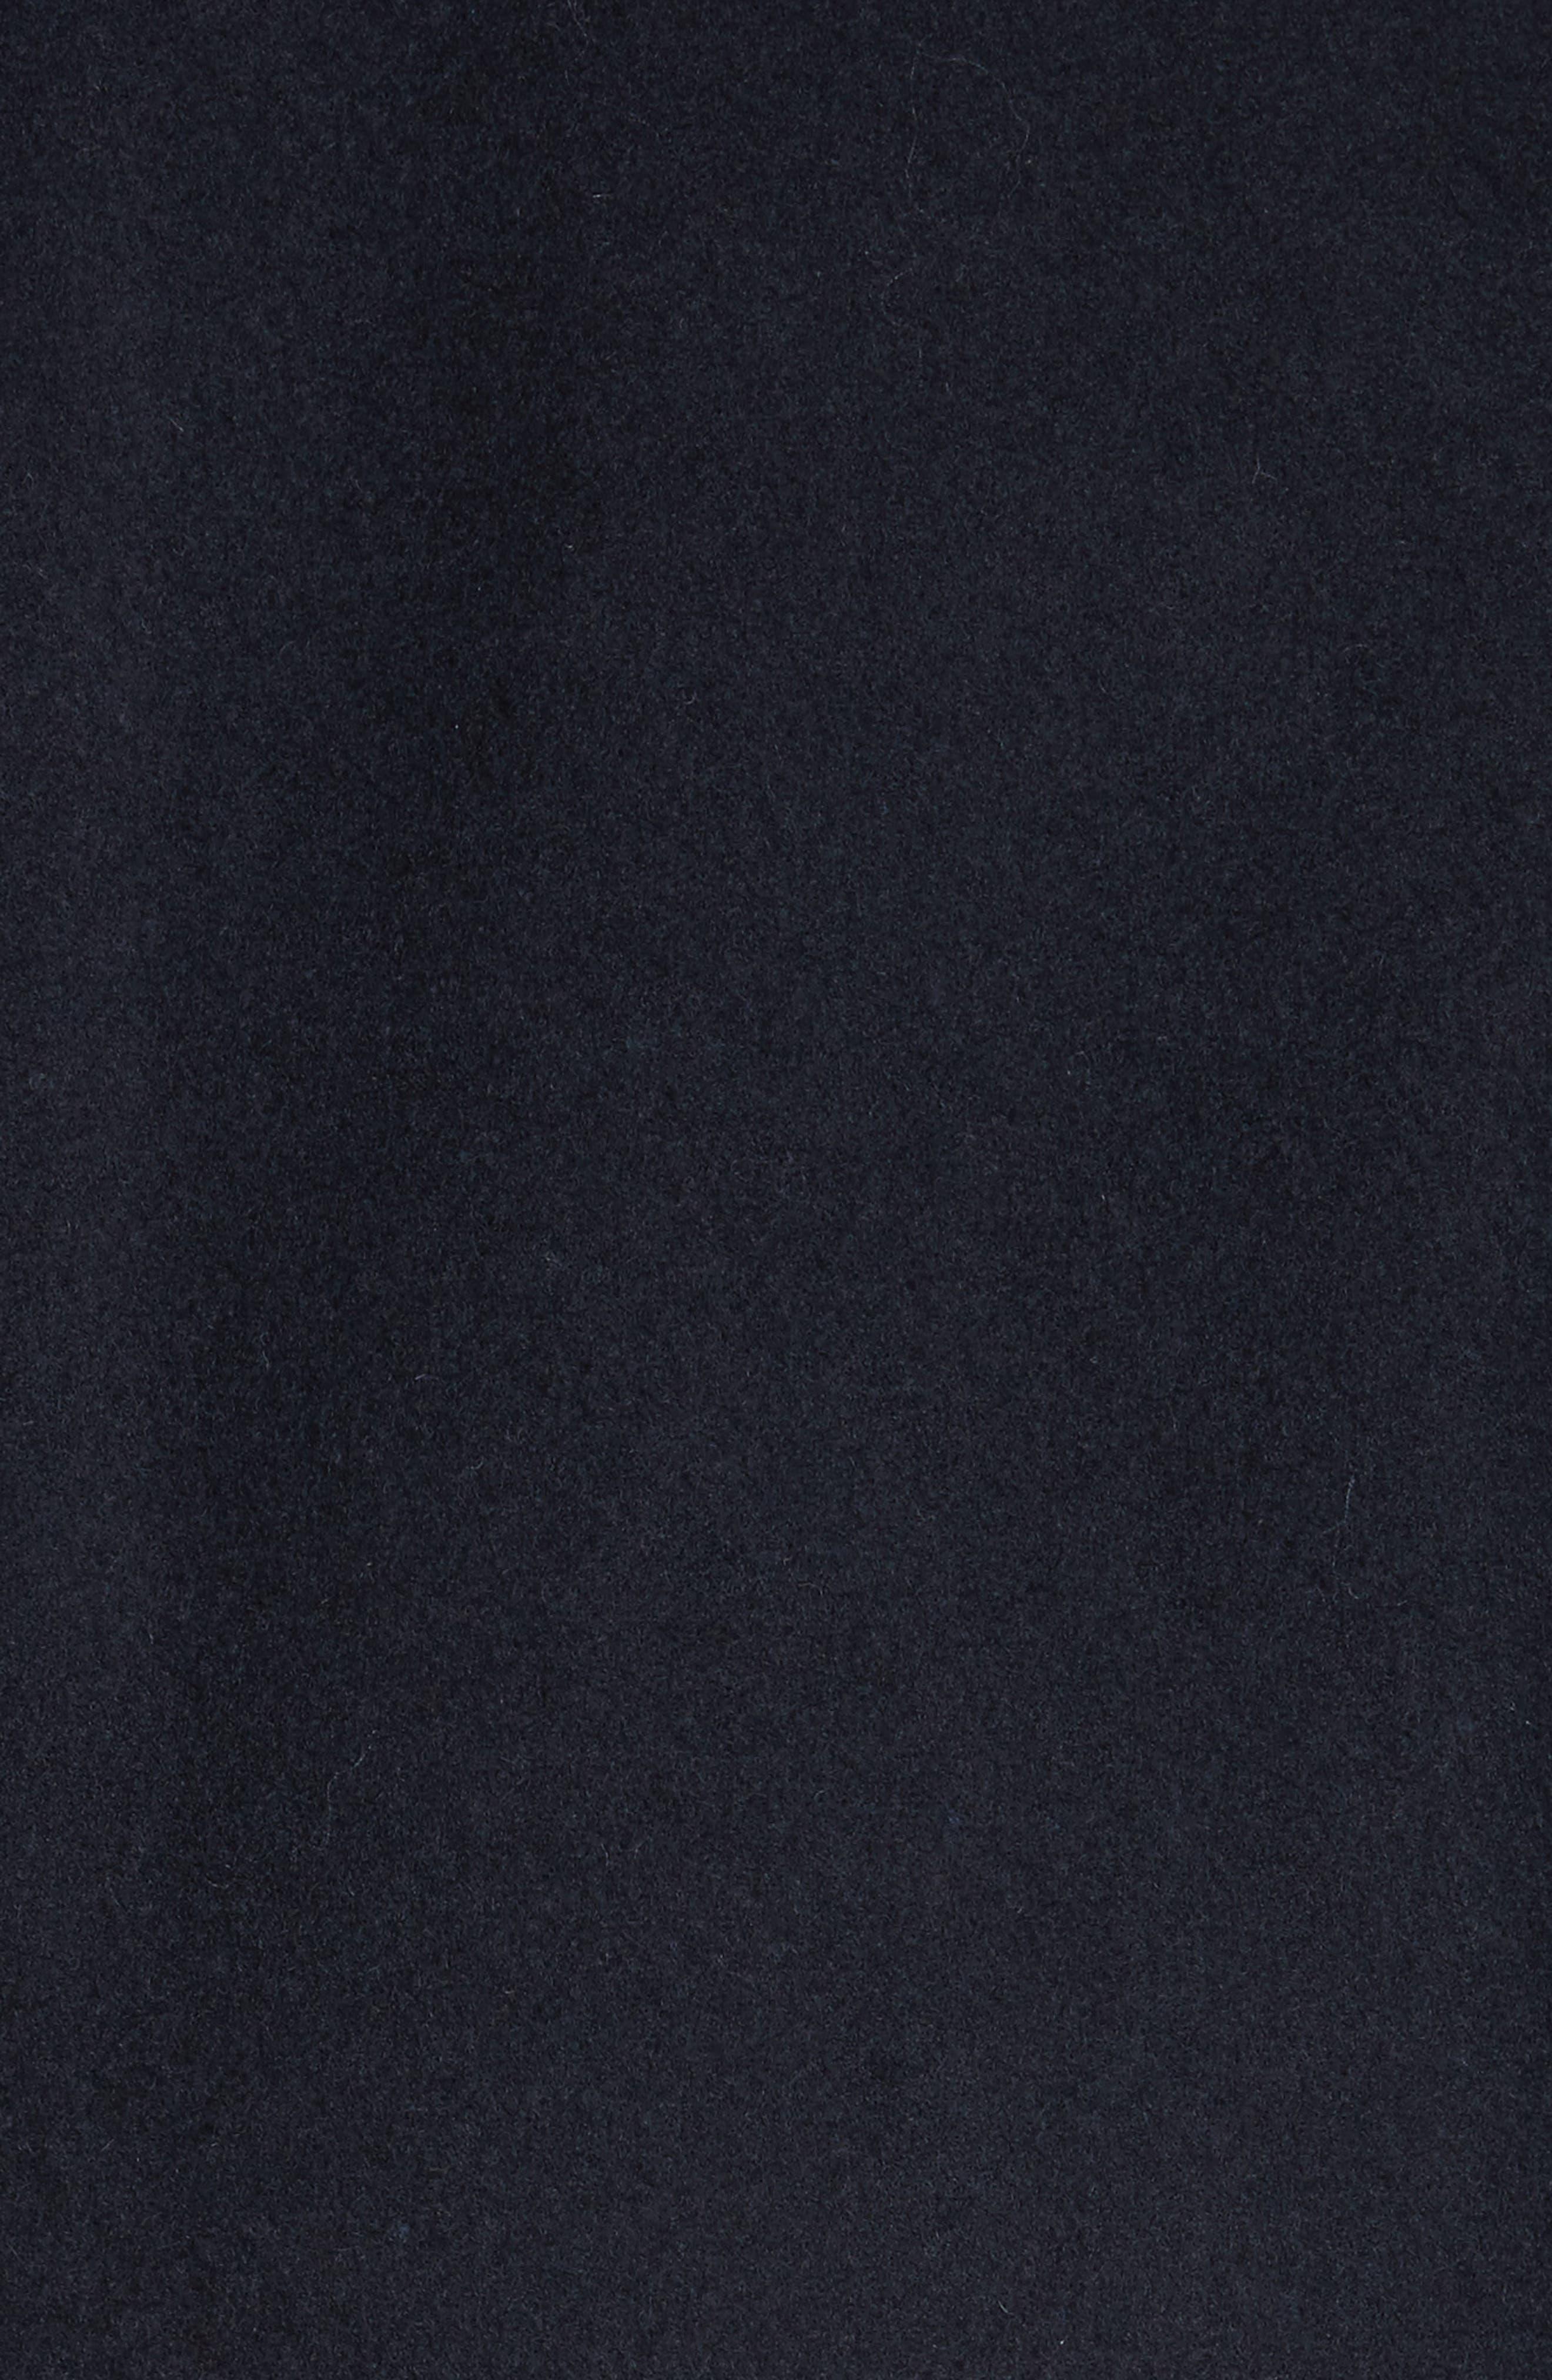 Hook Wool Blend Topcoat,                             Alternate thumbnail 5, color,                             Navy